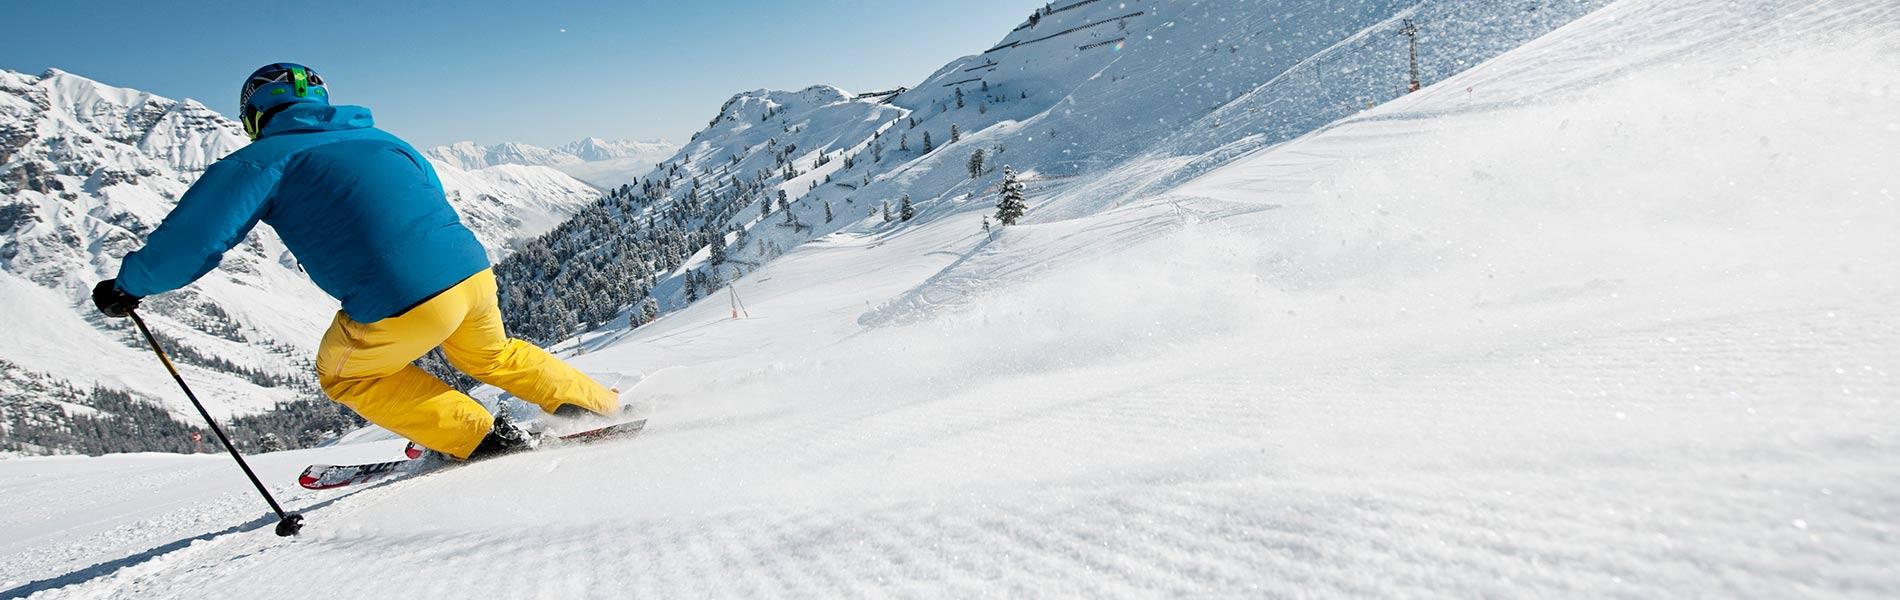 Winterurlaub in Tirol Urlaub im Hotel Happy Stubai Neustift